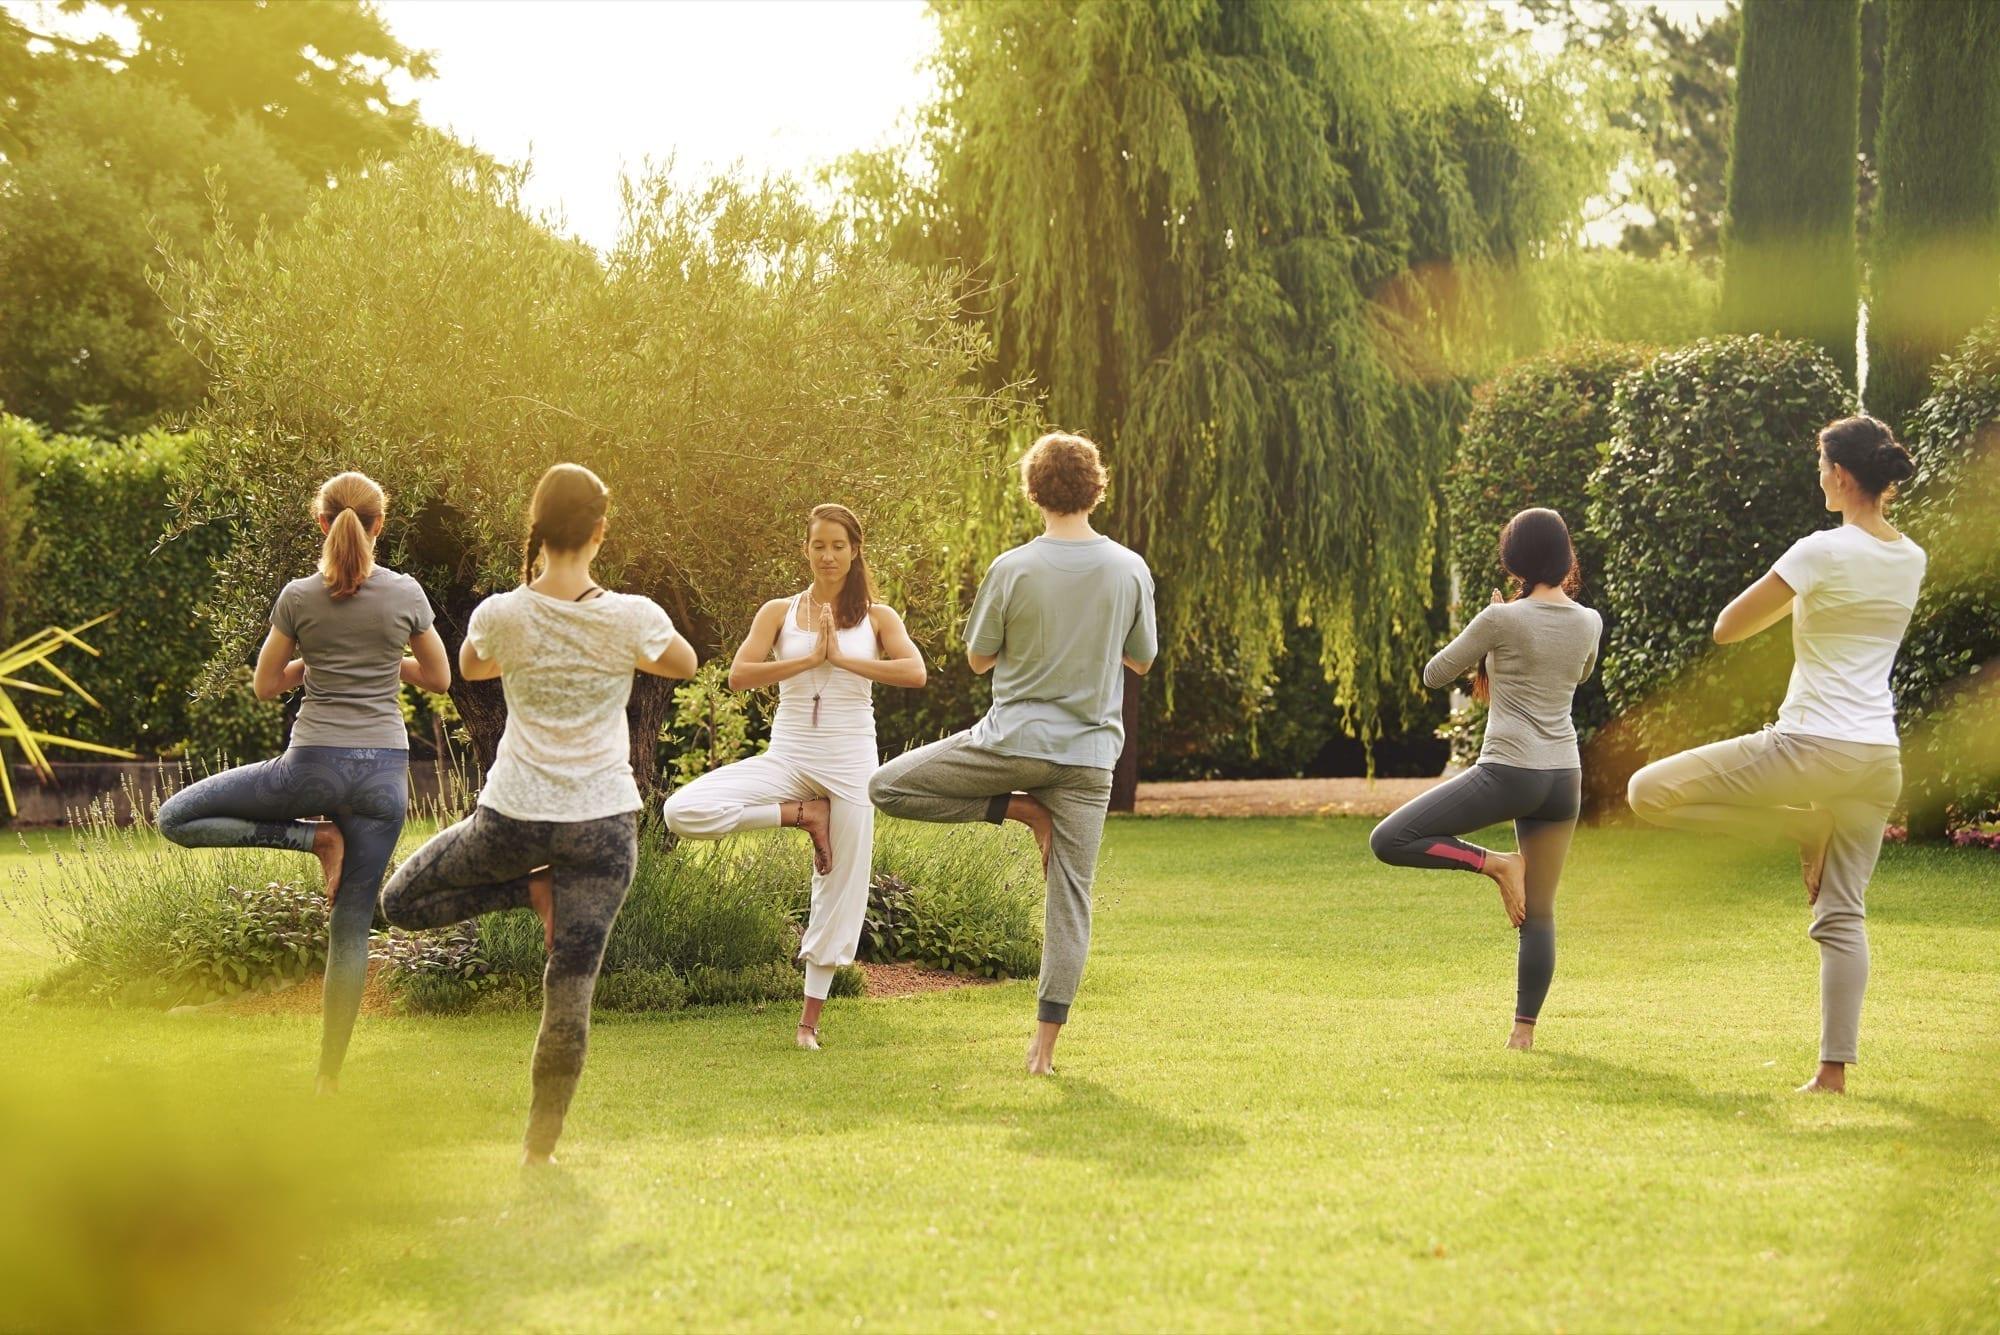 AYU_Yoga Garden_RGB_Low_GBA_01